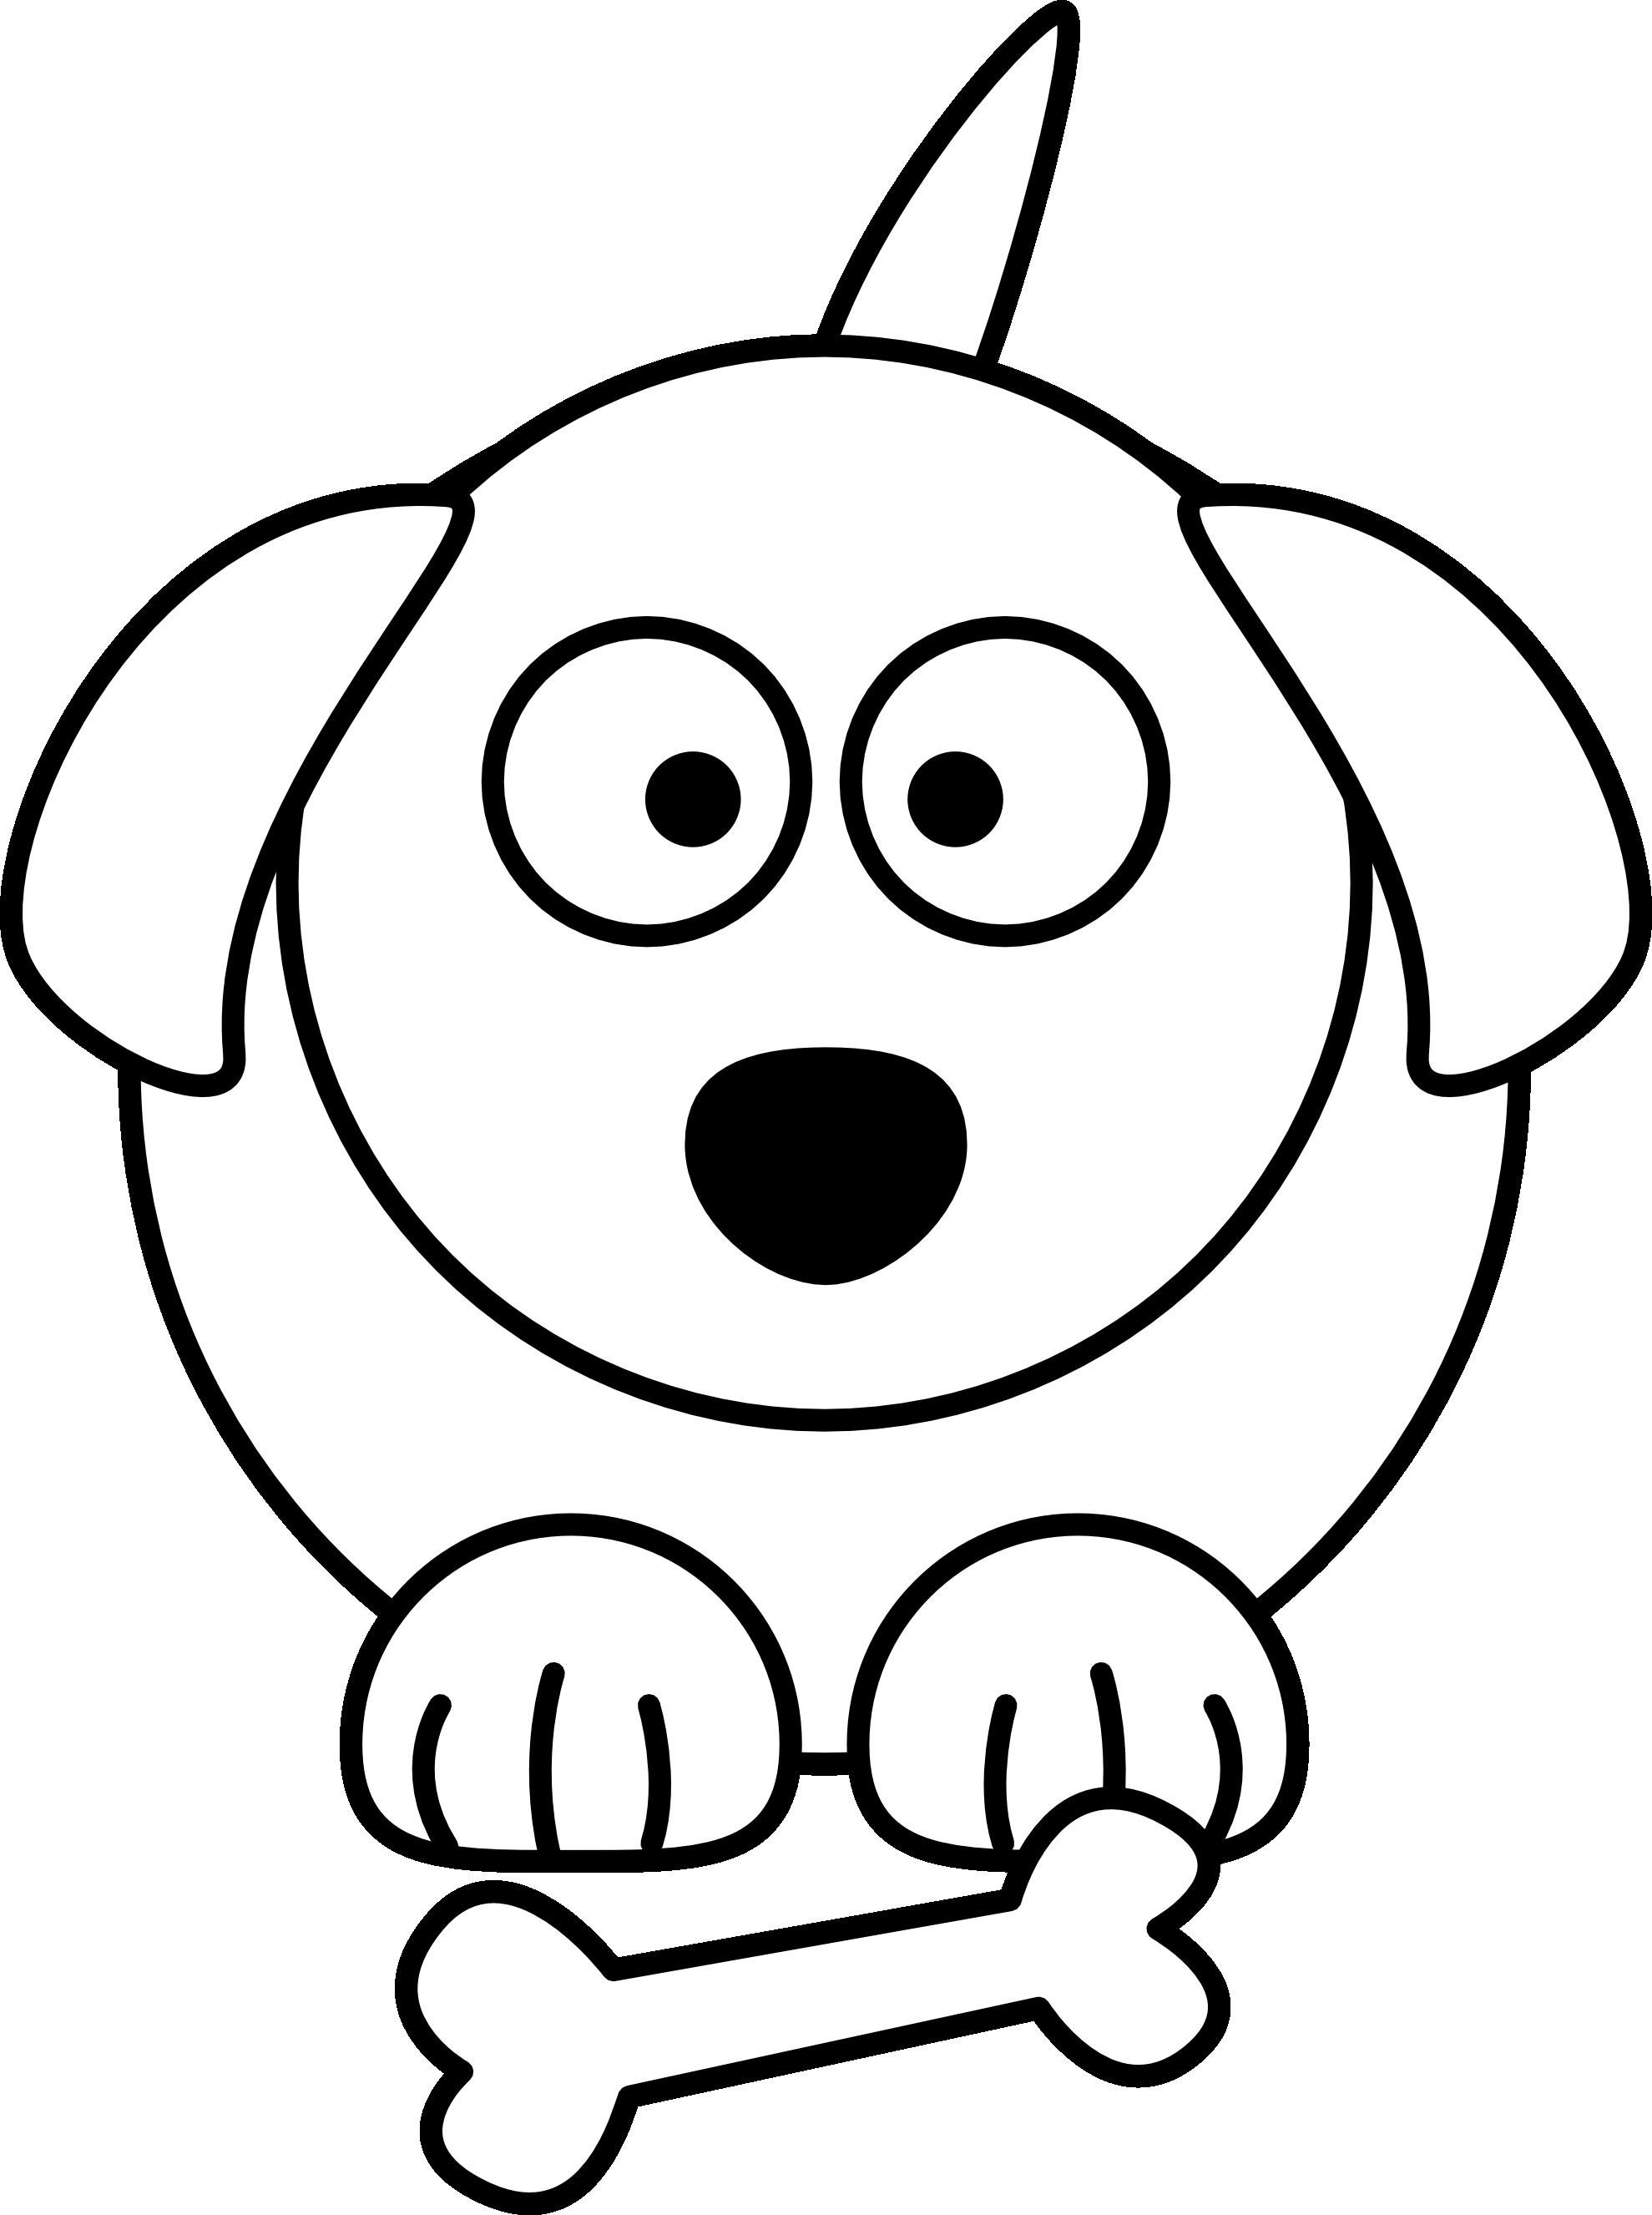 Easy animal. Black and white animals